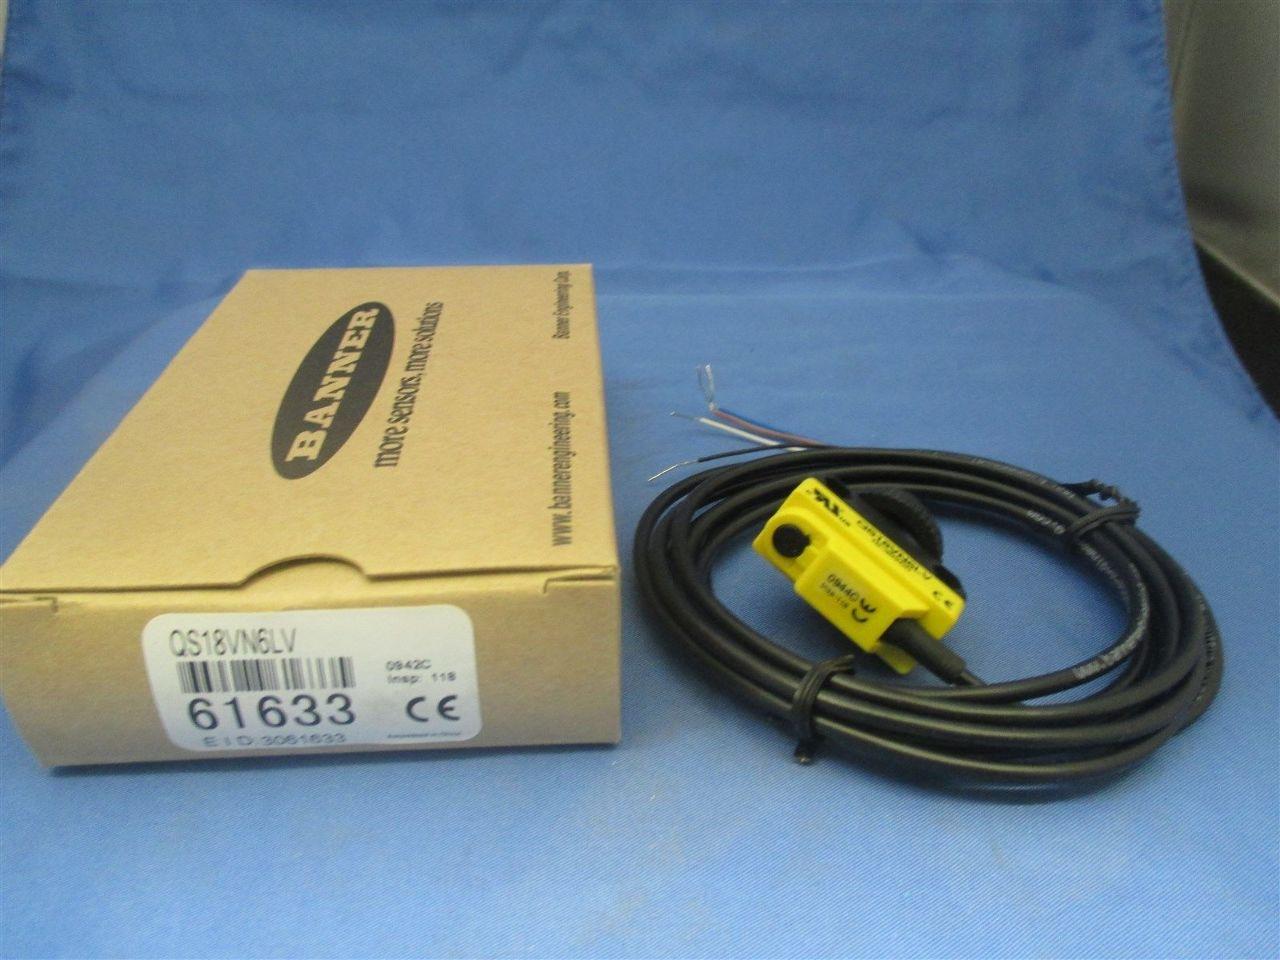 Banner QS18VN6LV 61633 Photoelectric Sensor new | Process Industrial ...